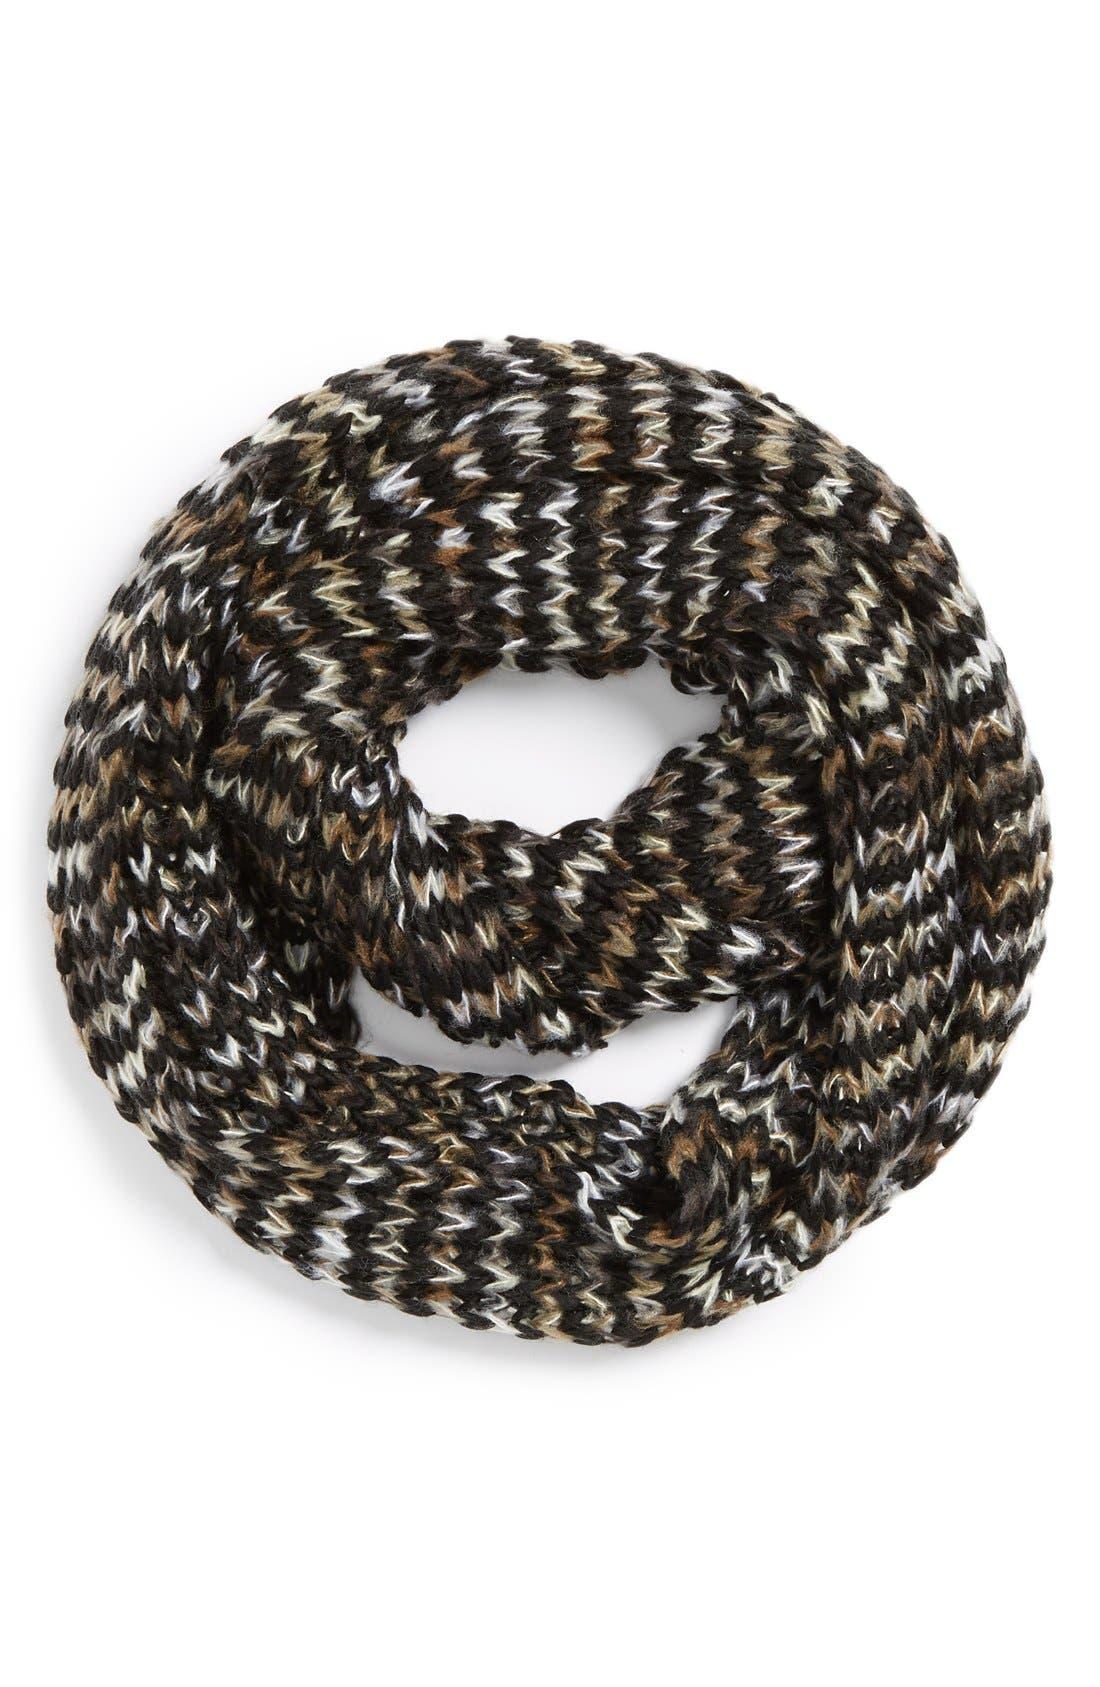 Alternate Image 1 Selected - BP. Marled Chevron Knit Infinity Scarf (Juniors)